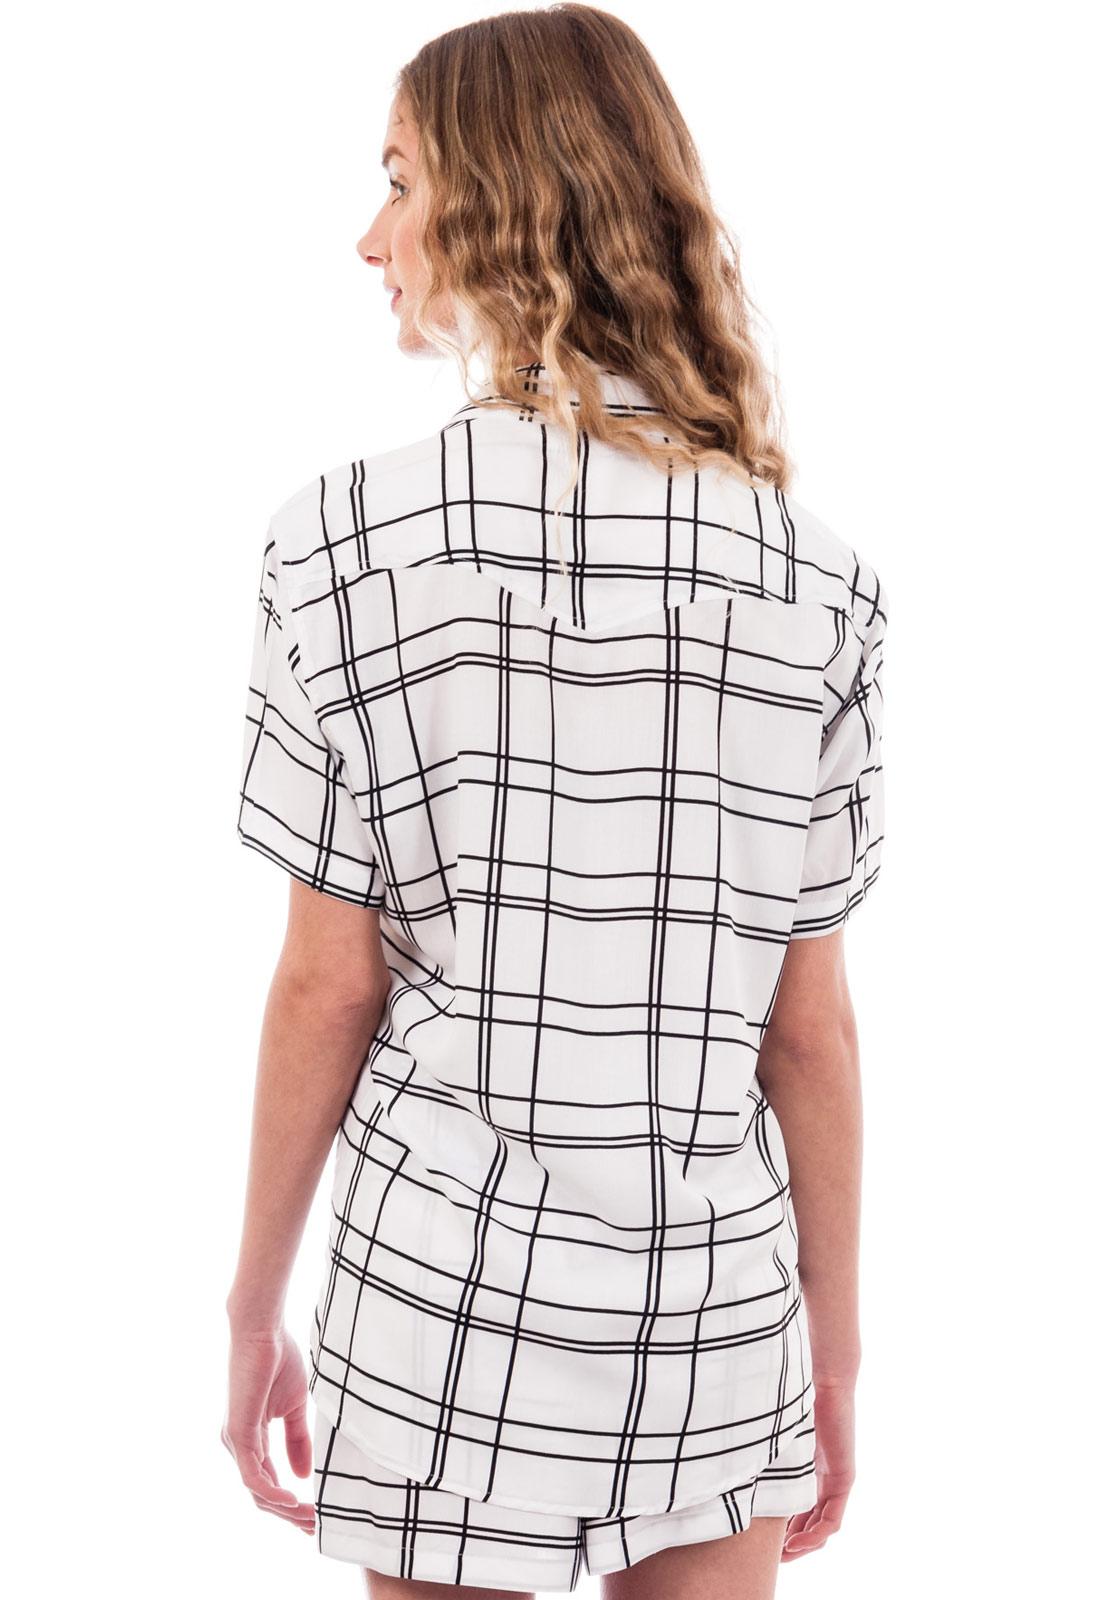 Camisa Estampada Minimalismo Listras Listrada ElephunK Branca